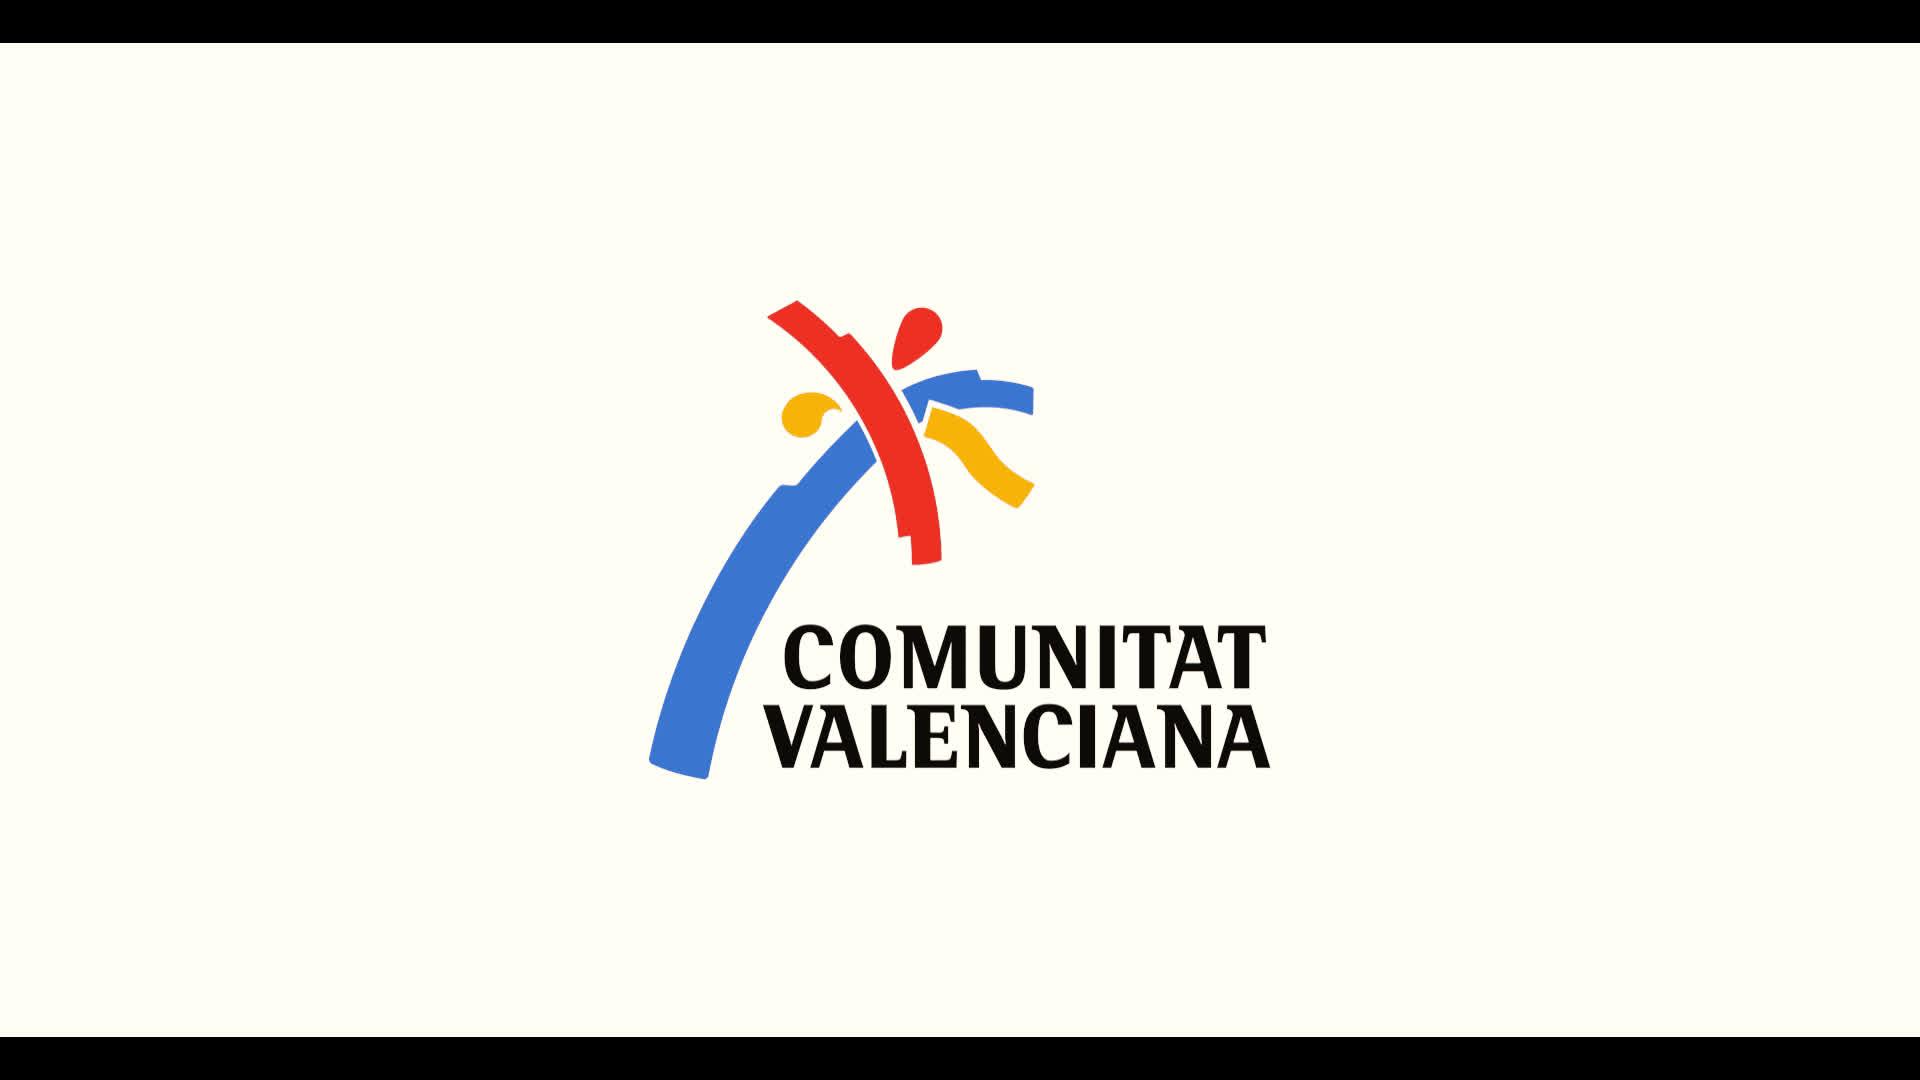 https://multimedia.comunitatvalenciana.com/1A3821679A04436A94CDD6066B327AEA/vid/1C17E6286B6A4AAC8532ADB5B4C97AD6/5_-_Isla_de_tabarca_V3.mp4